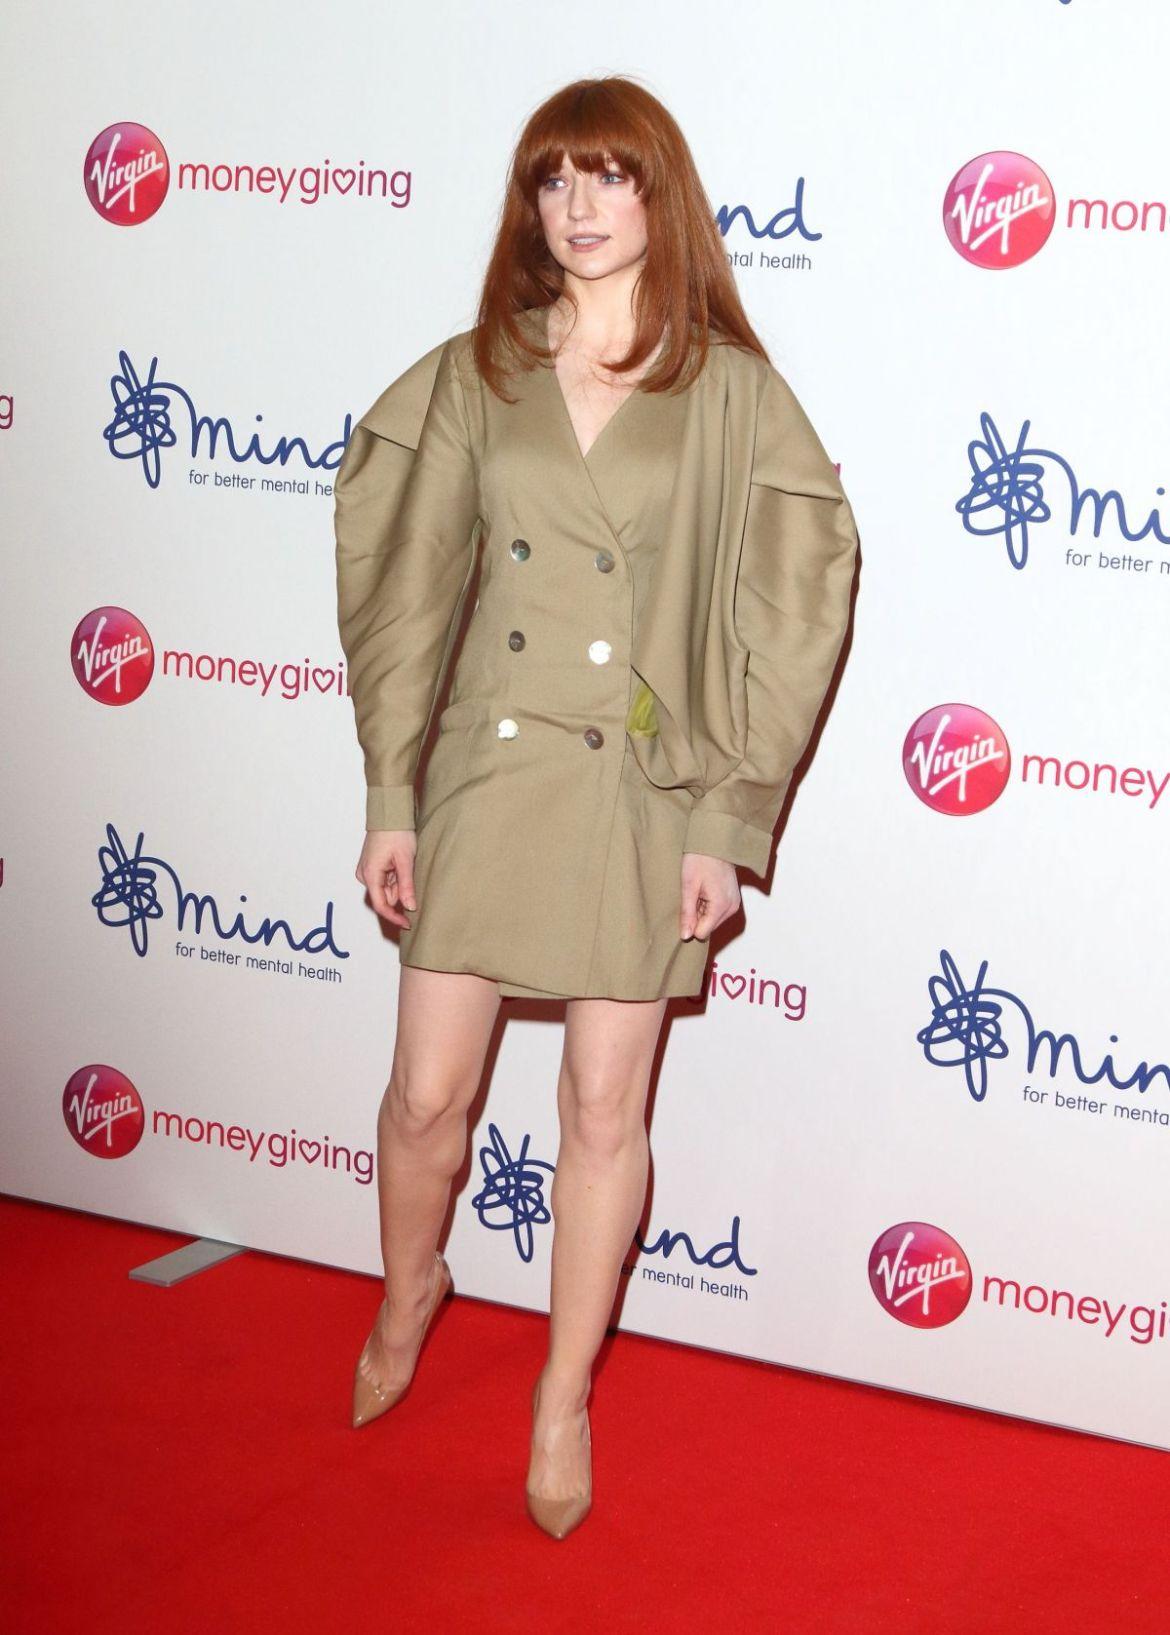 NICOLA ROBERTS at Virgin Money Giving Mind Media Awards in London 11/29/2018